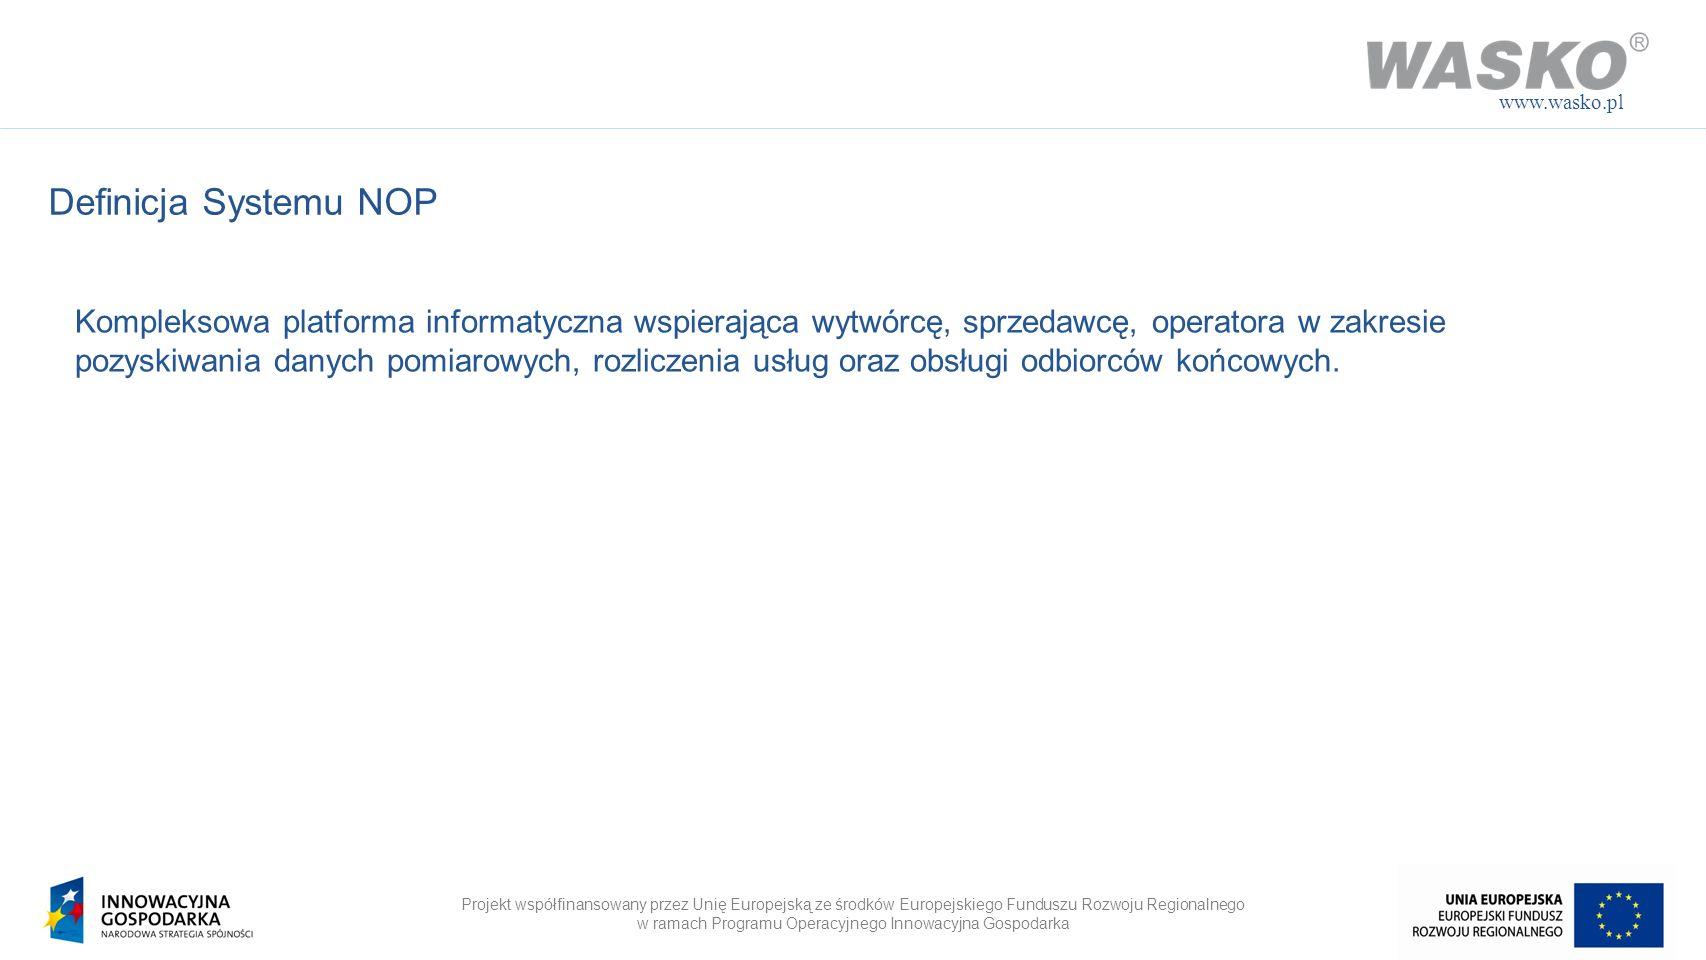 www.wasko.pl Definicja Systemu NOP.